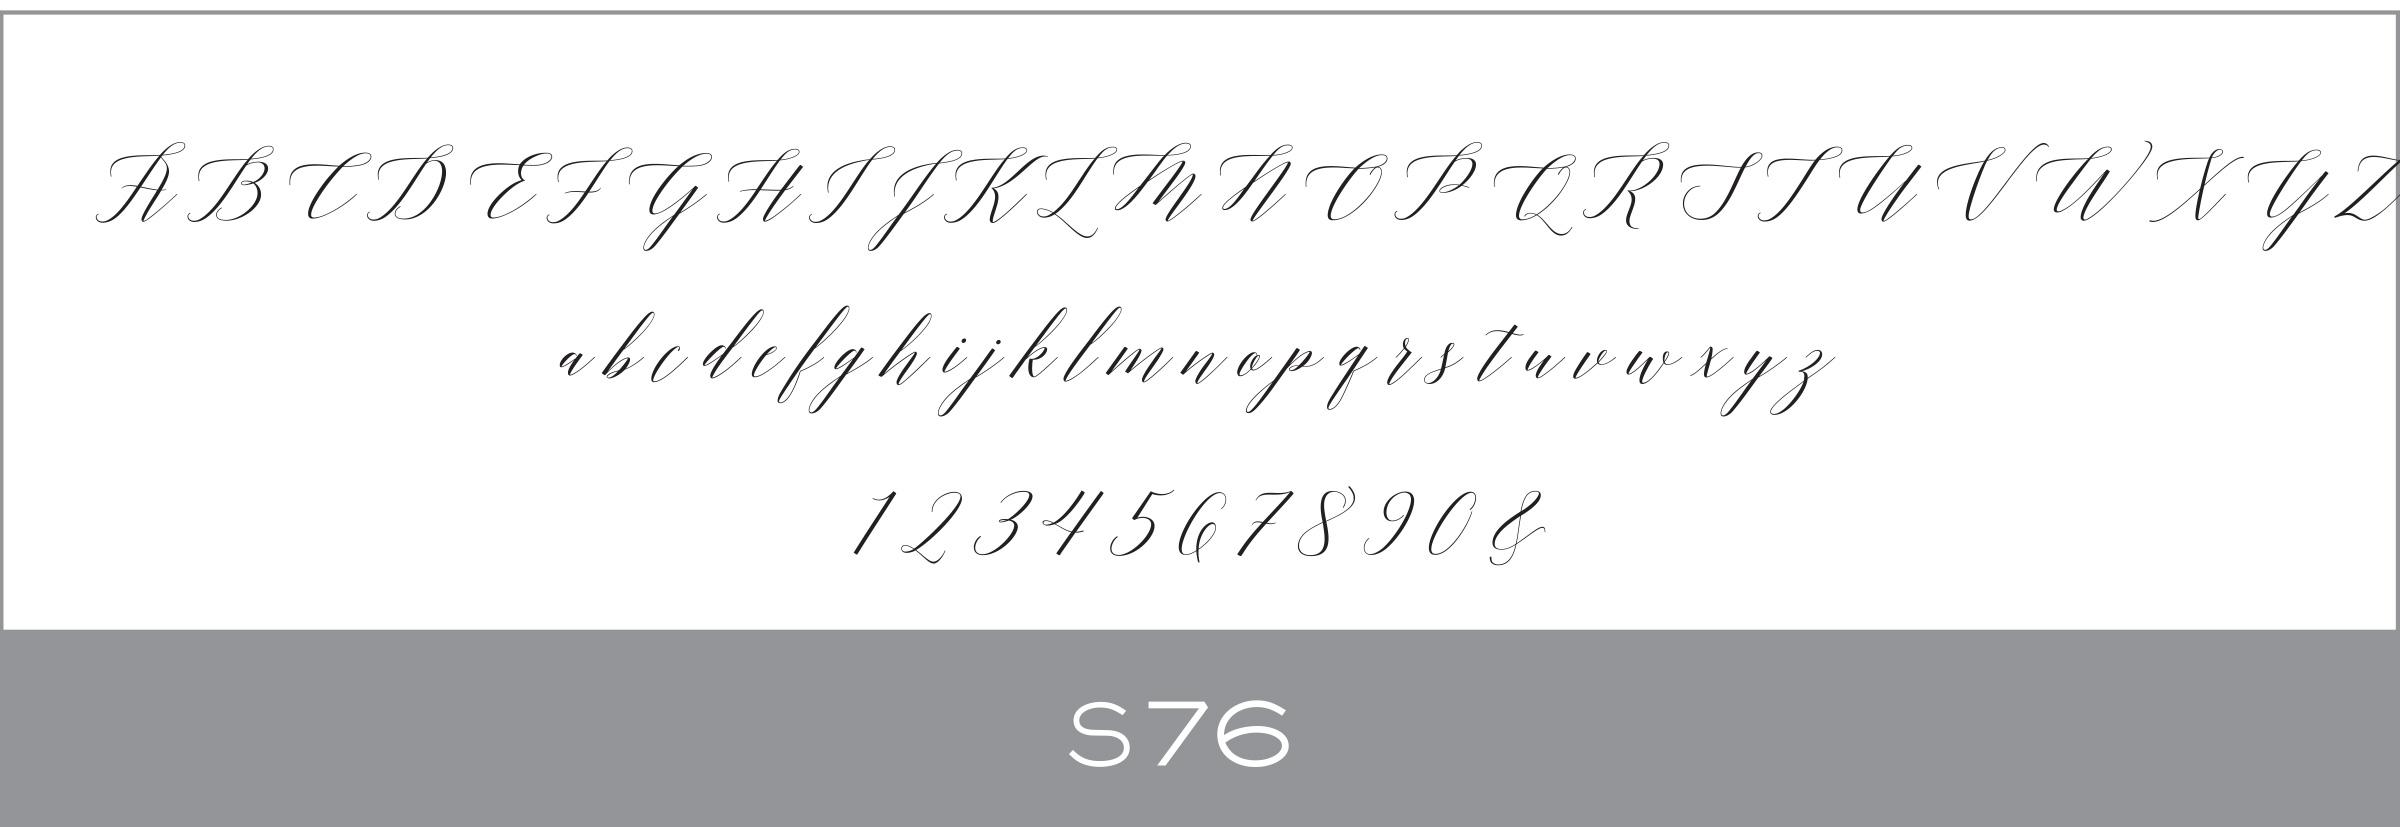 S76_Haute_Papier_Font.jpg